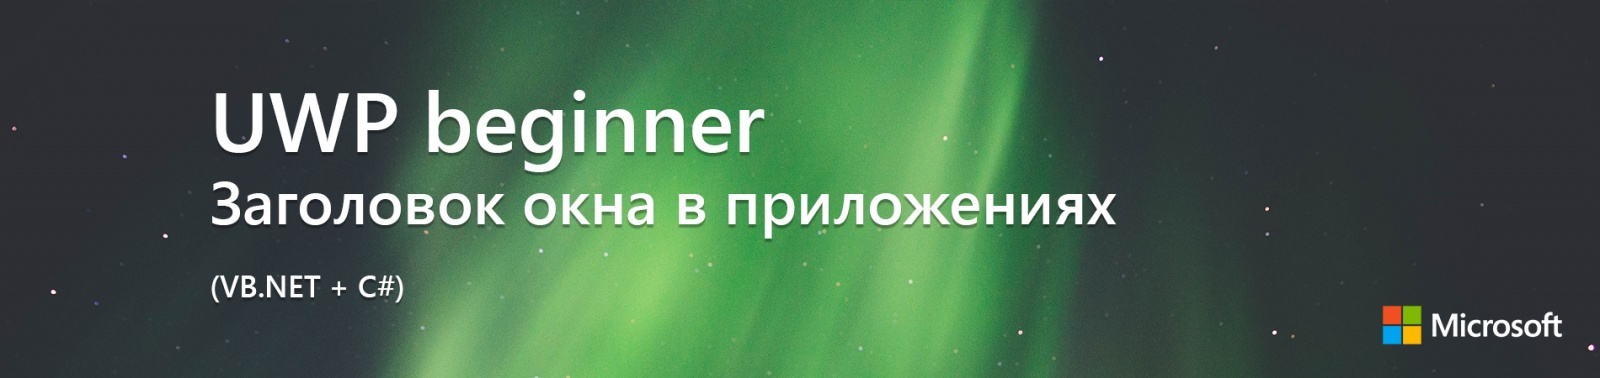 UWP beginner: Заголовок окна в приложениях (VB.NET + C#) - 1